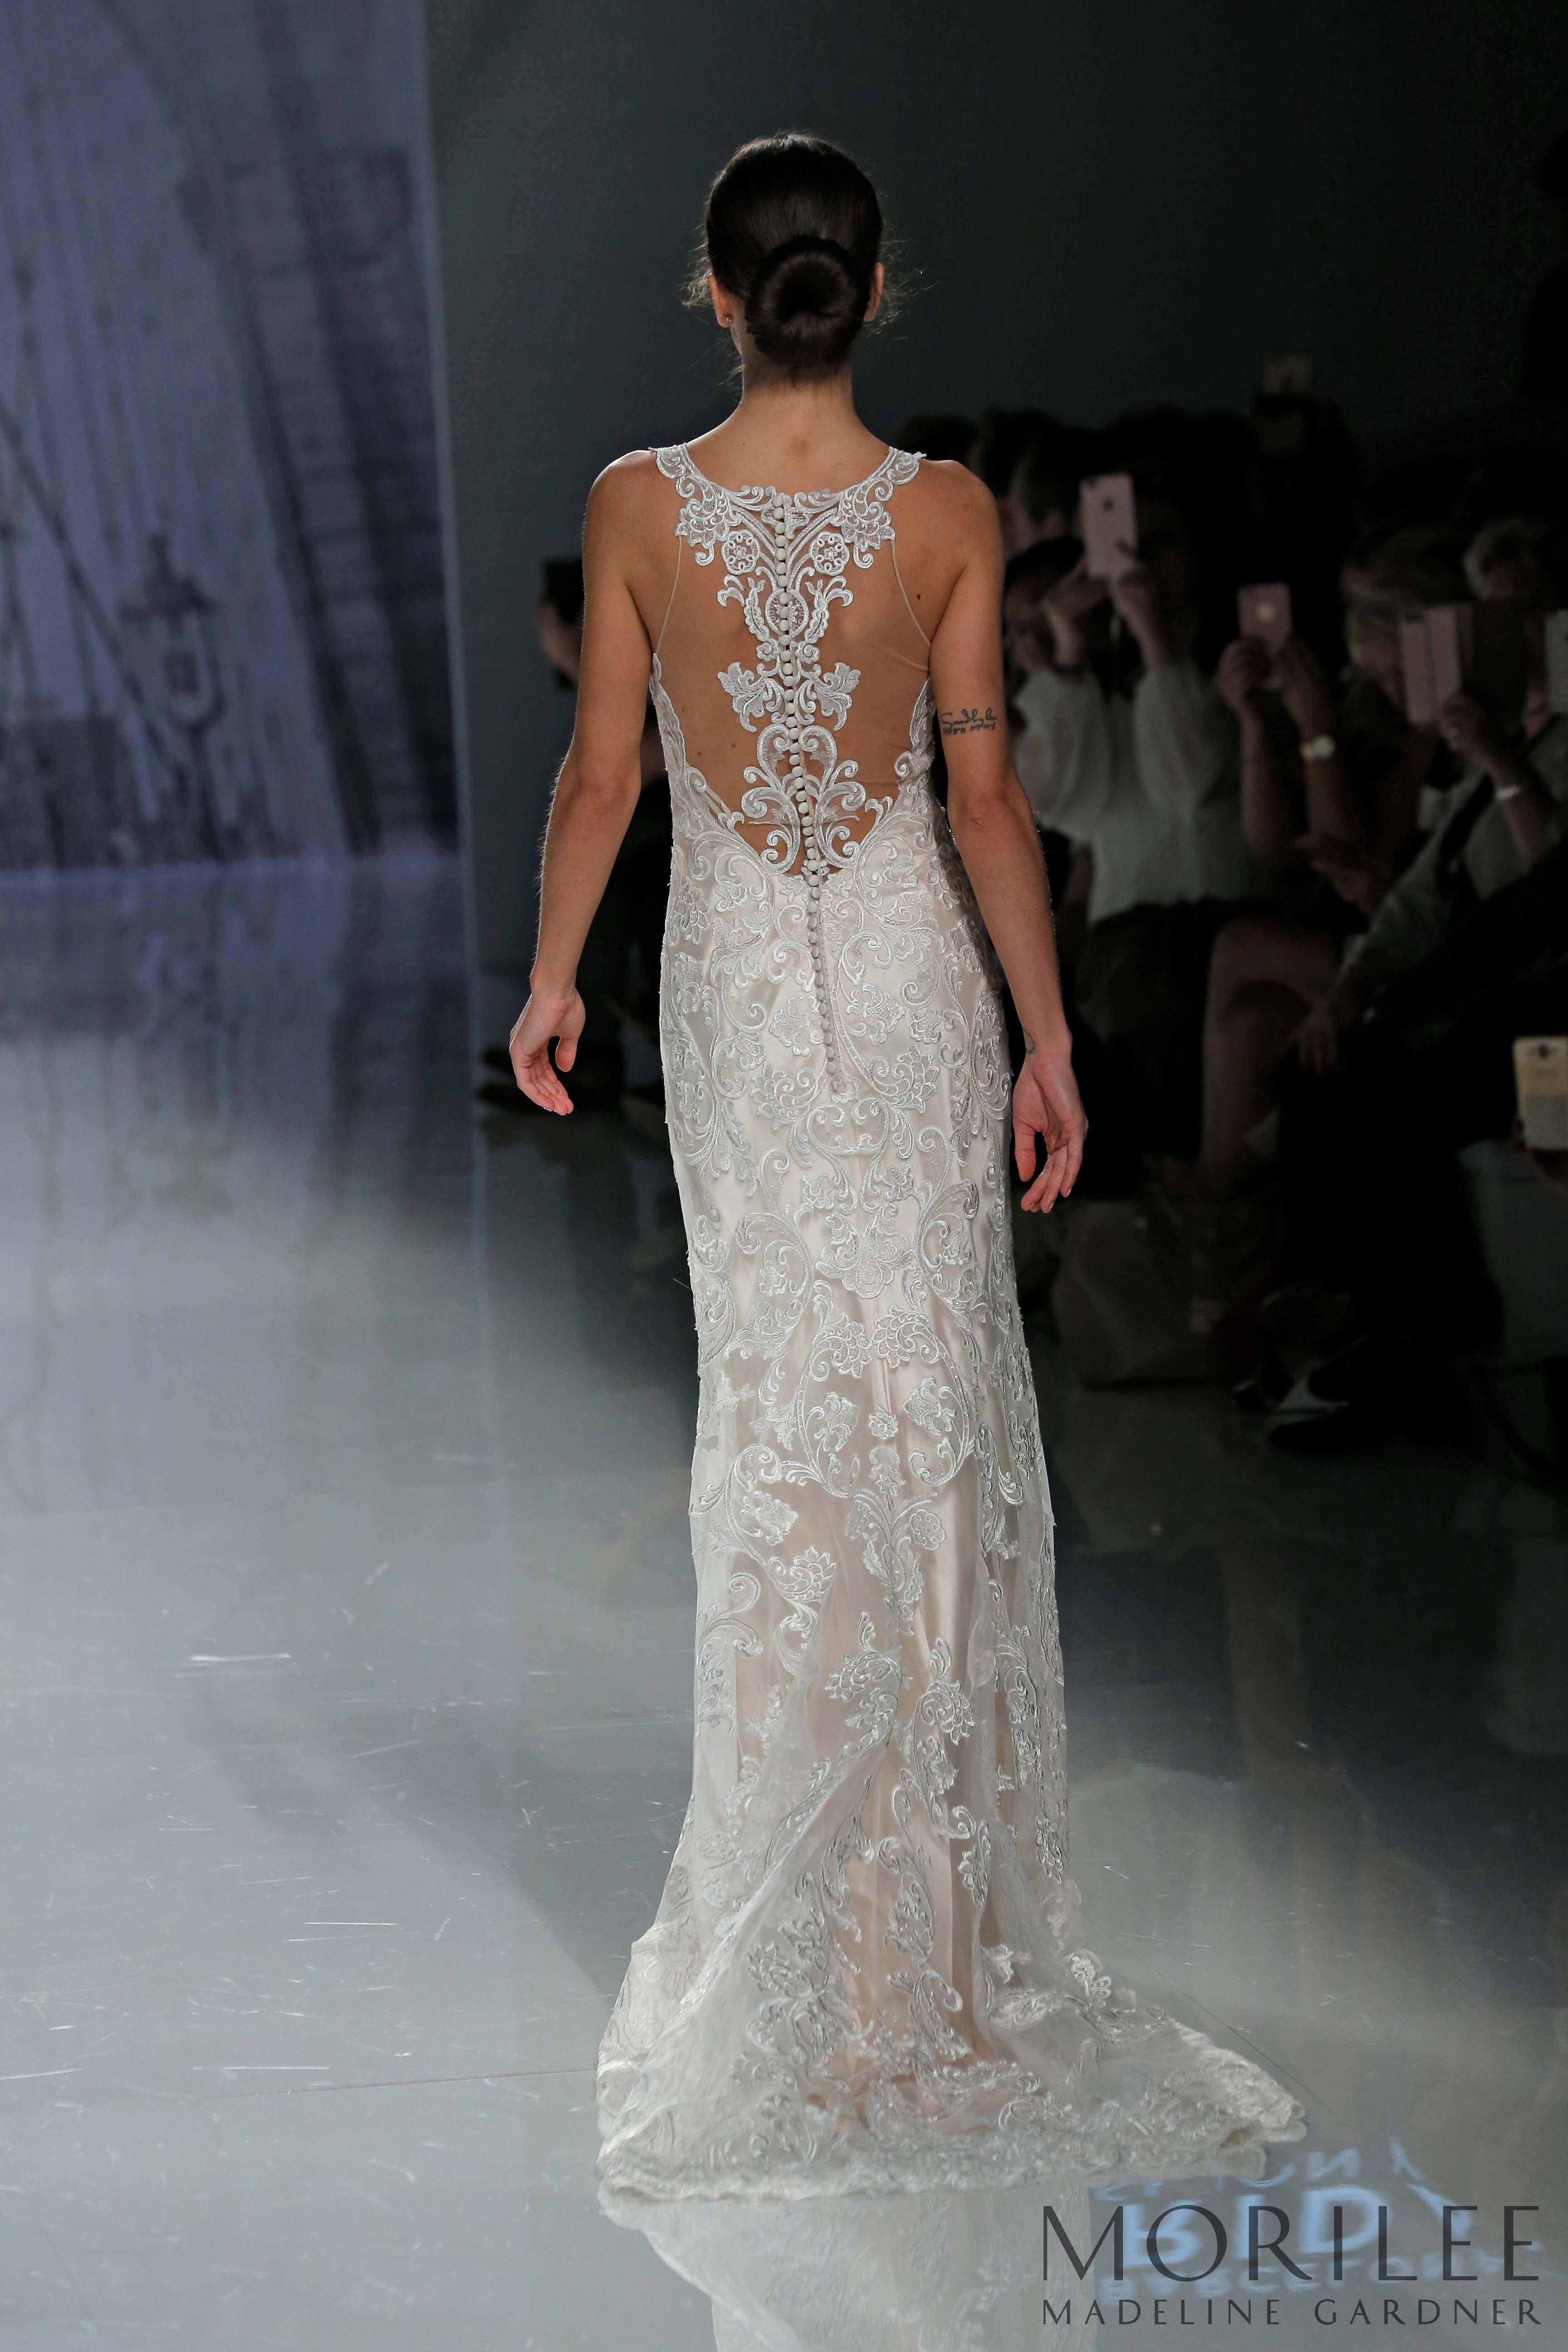 Mimi Wedding Dress Morilee In 2020 Bridal Dresses Bridal